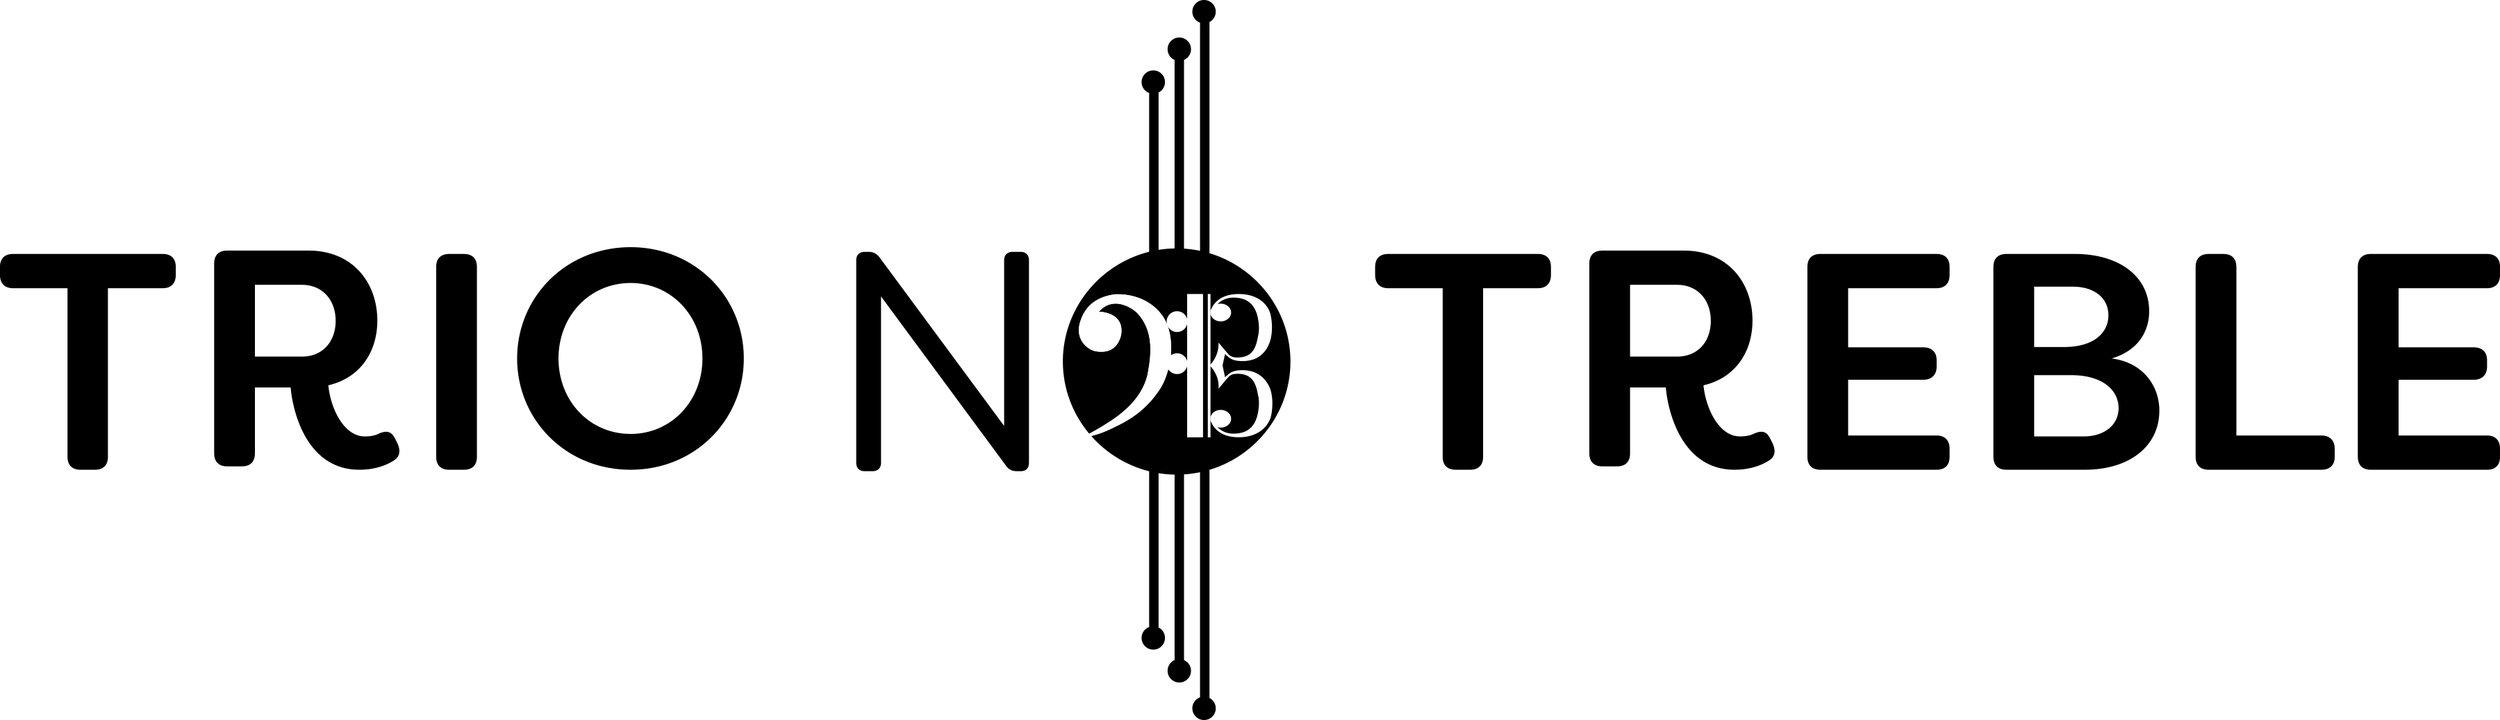 TrioNoTreble_logo_sort.jpg